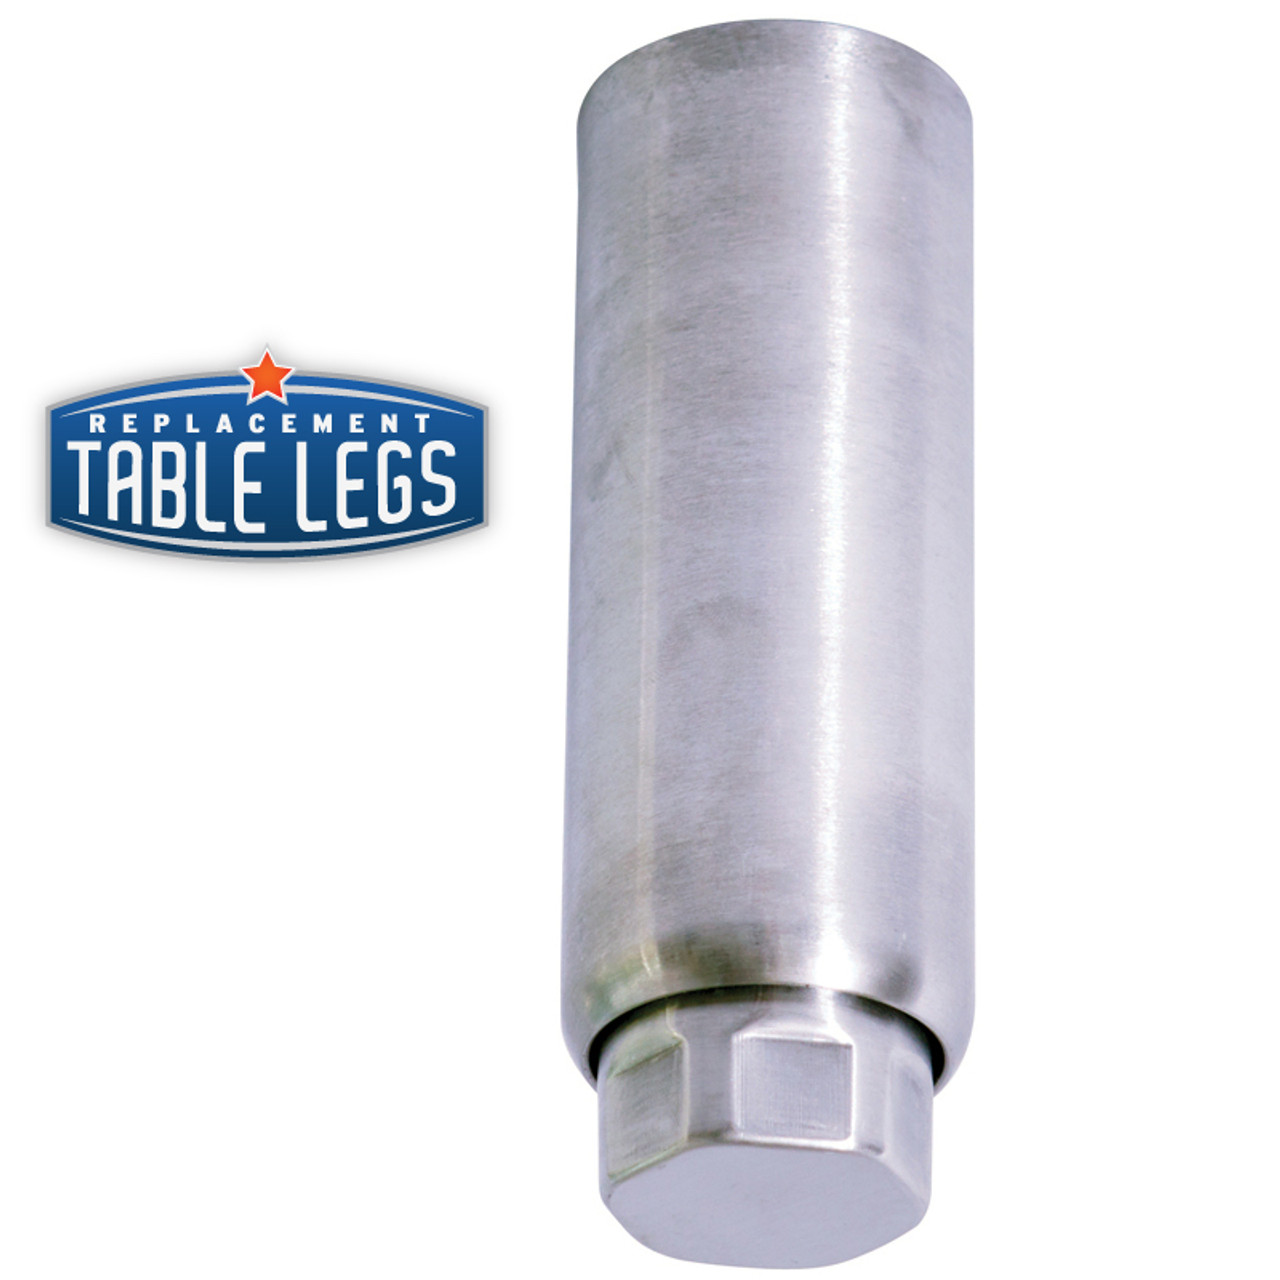 Heavy Duty Equipment Leg, Food Grade Stainless Steel, 6'' Equipment Leg,  2'' diameter, 1-7/16'' adjustable foot - replacementtablelegs.com